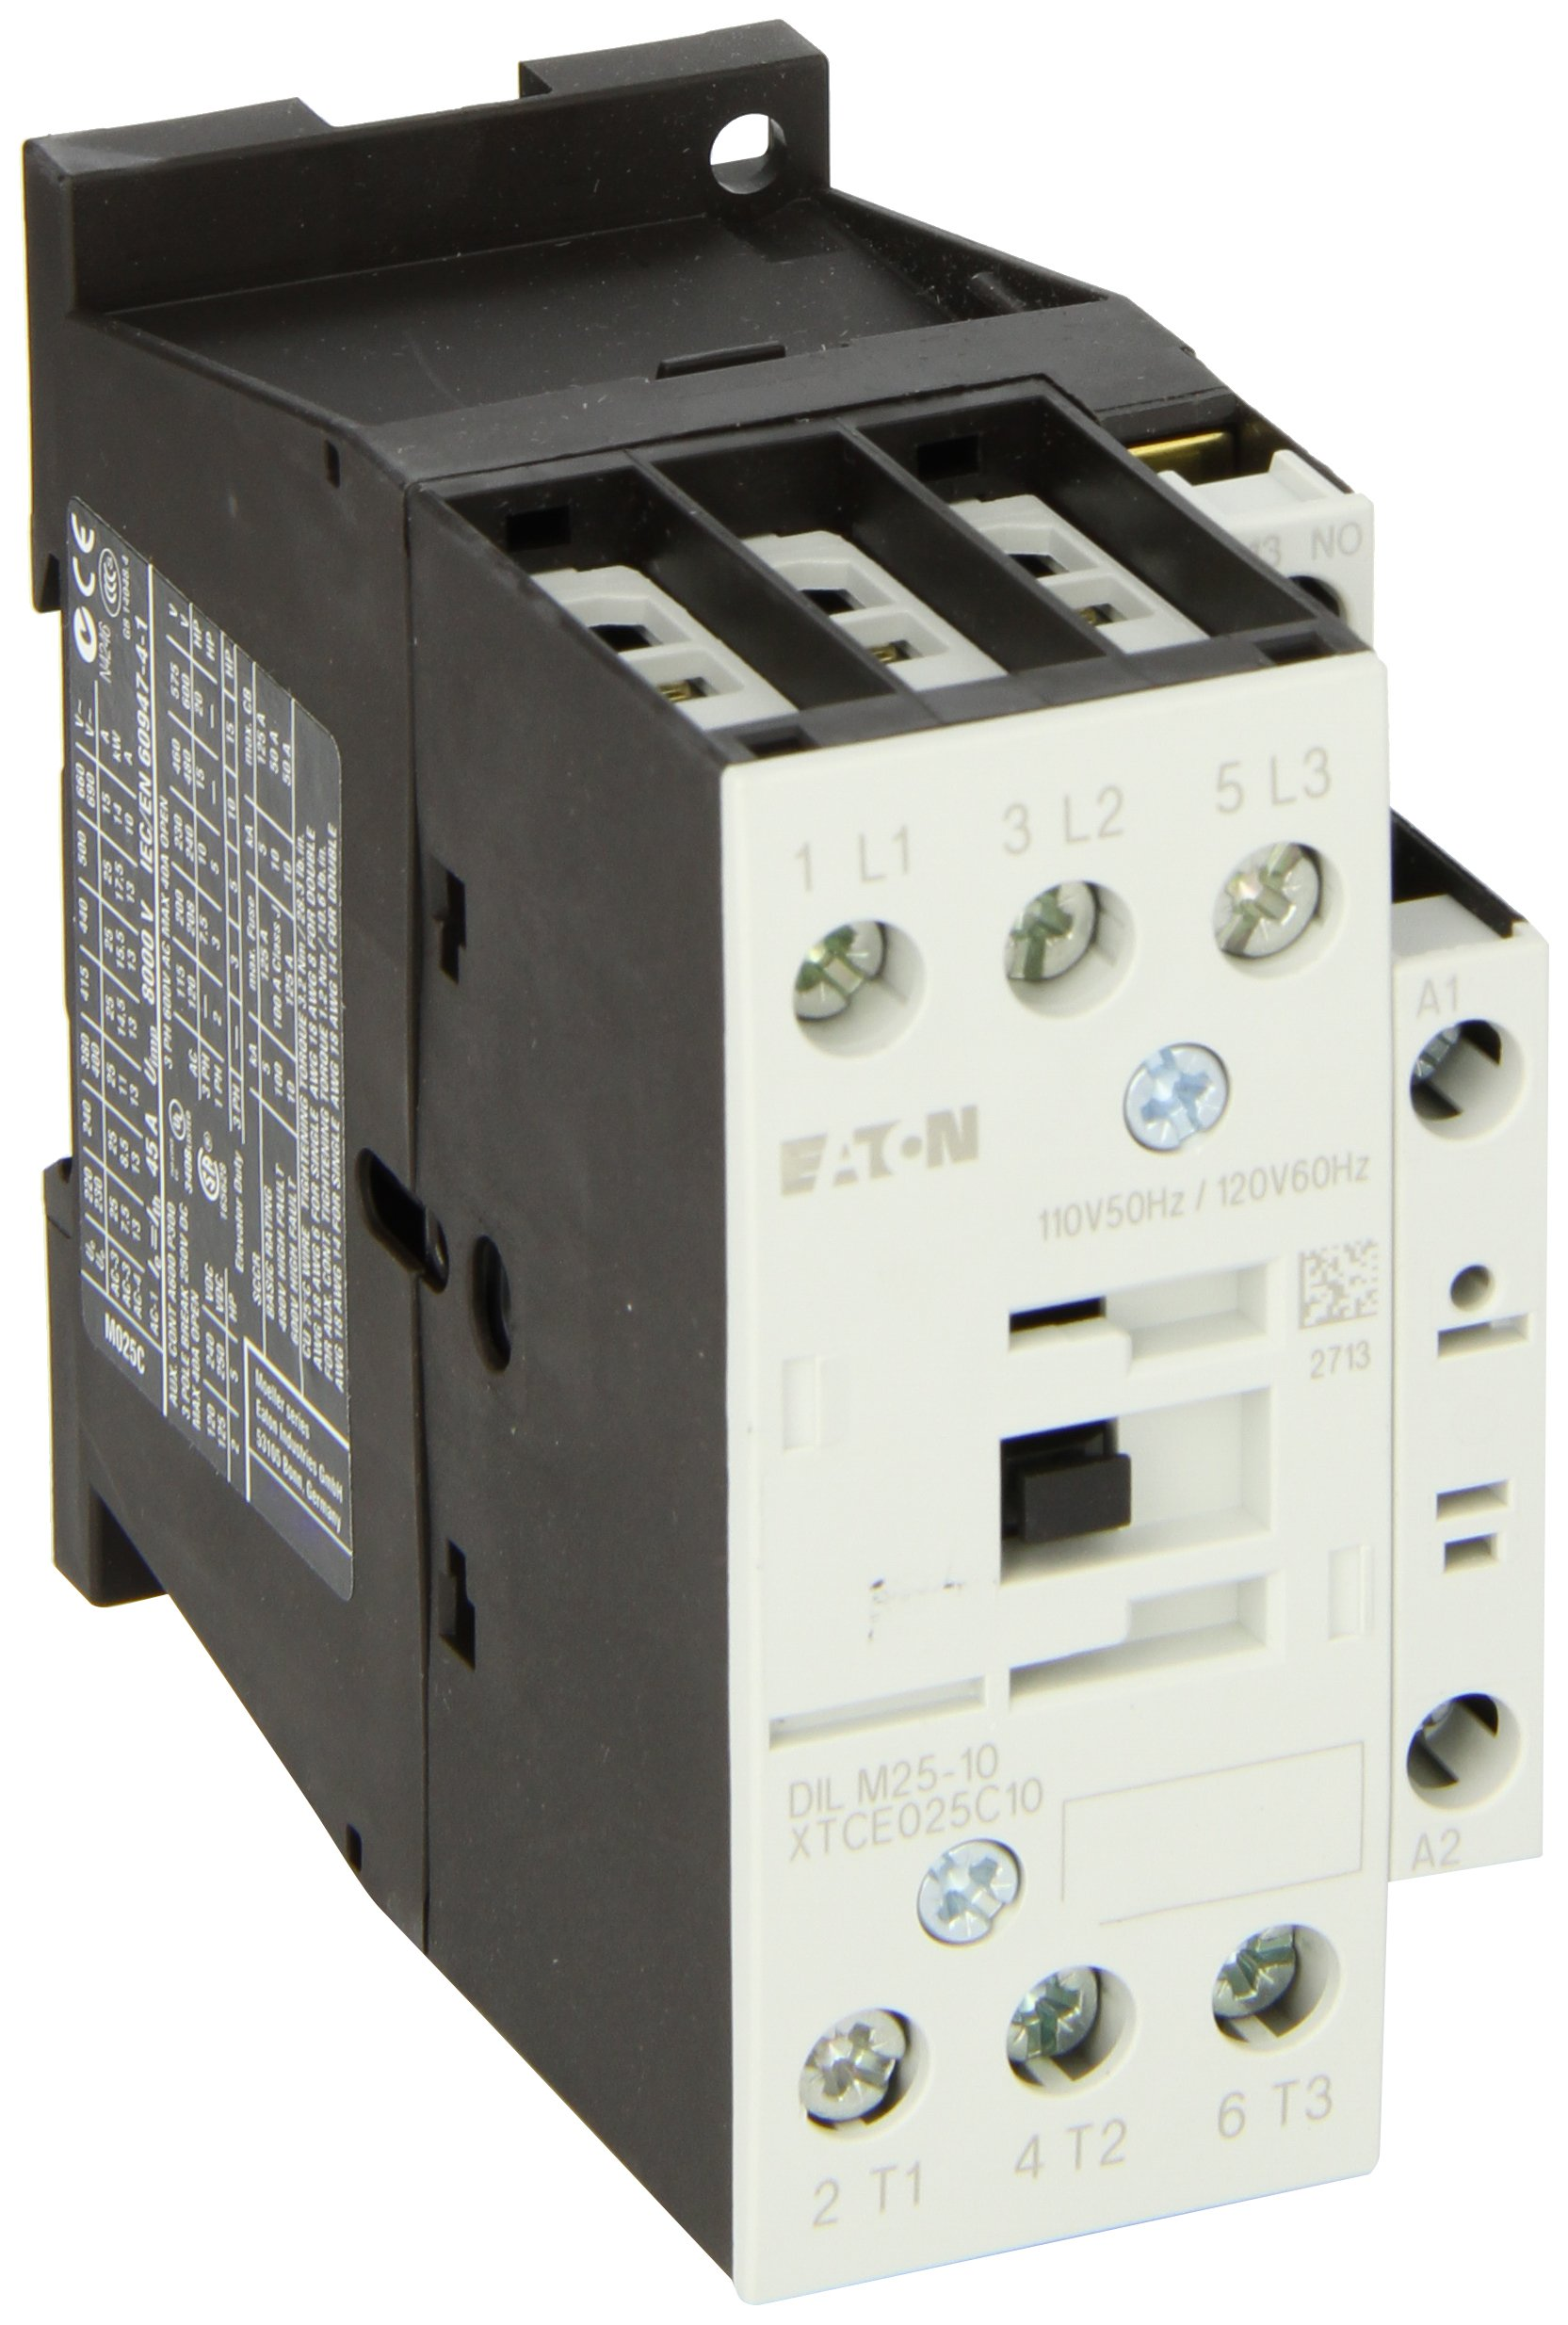 Eaton XTCE025C10A XT-IEC Contactor and Starter, 45mm, 25A AC-3 Current Rating, 7-1/2 Max HP at 230VAC, 15 Max HP at 460VAC, 20 Max HP at 575VAC, 120VAC Coil Voltage